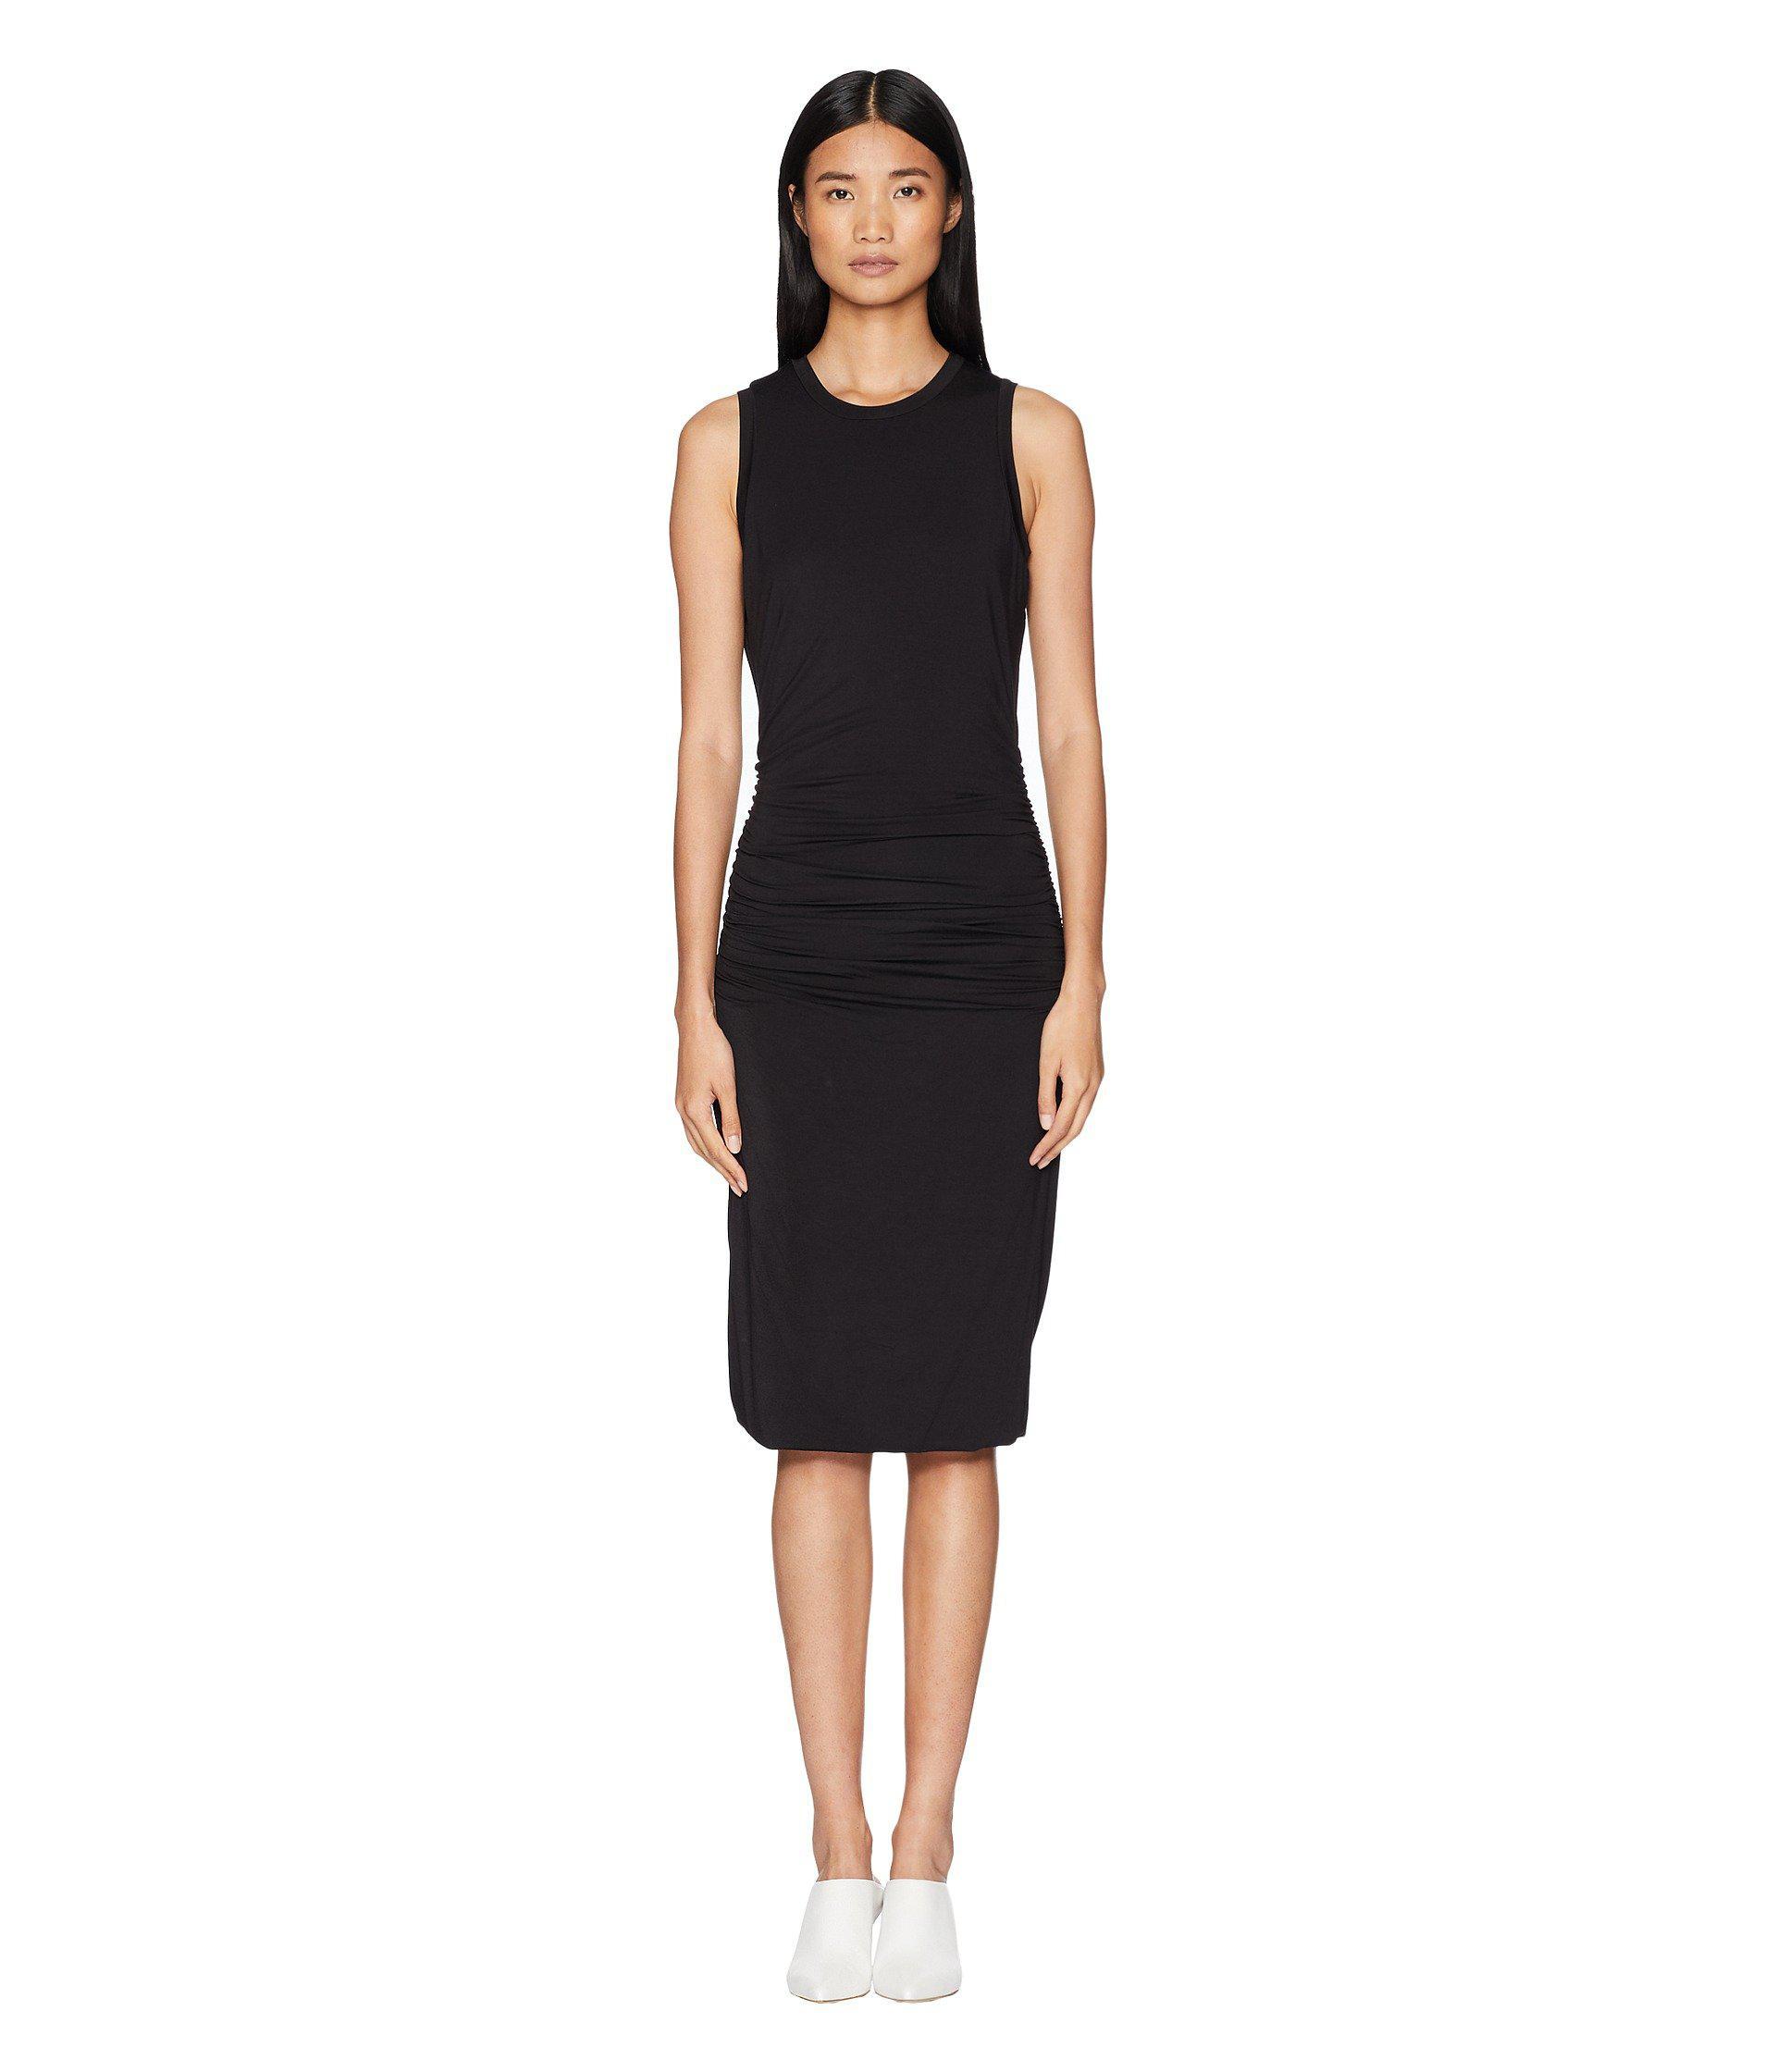 8b34339bf2c Halston. Women s Black Sleeveless Scoop Neck Ruched Midi Jersey Dress